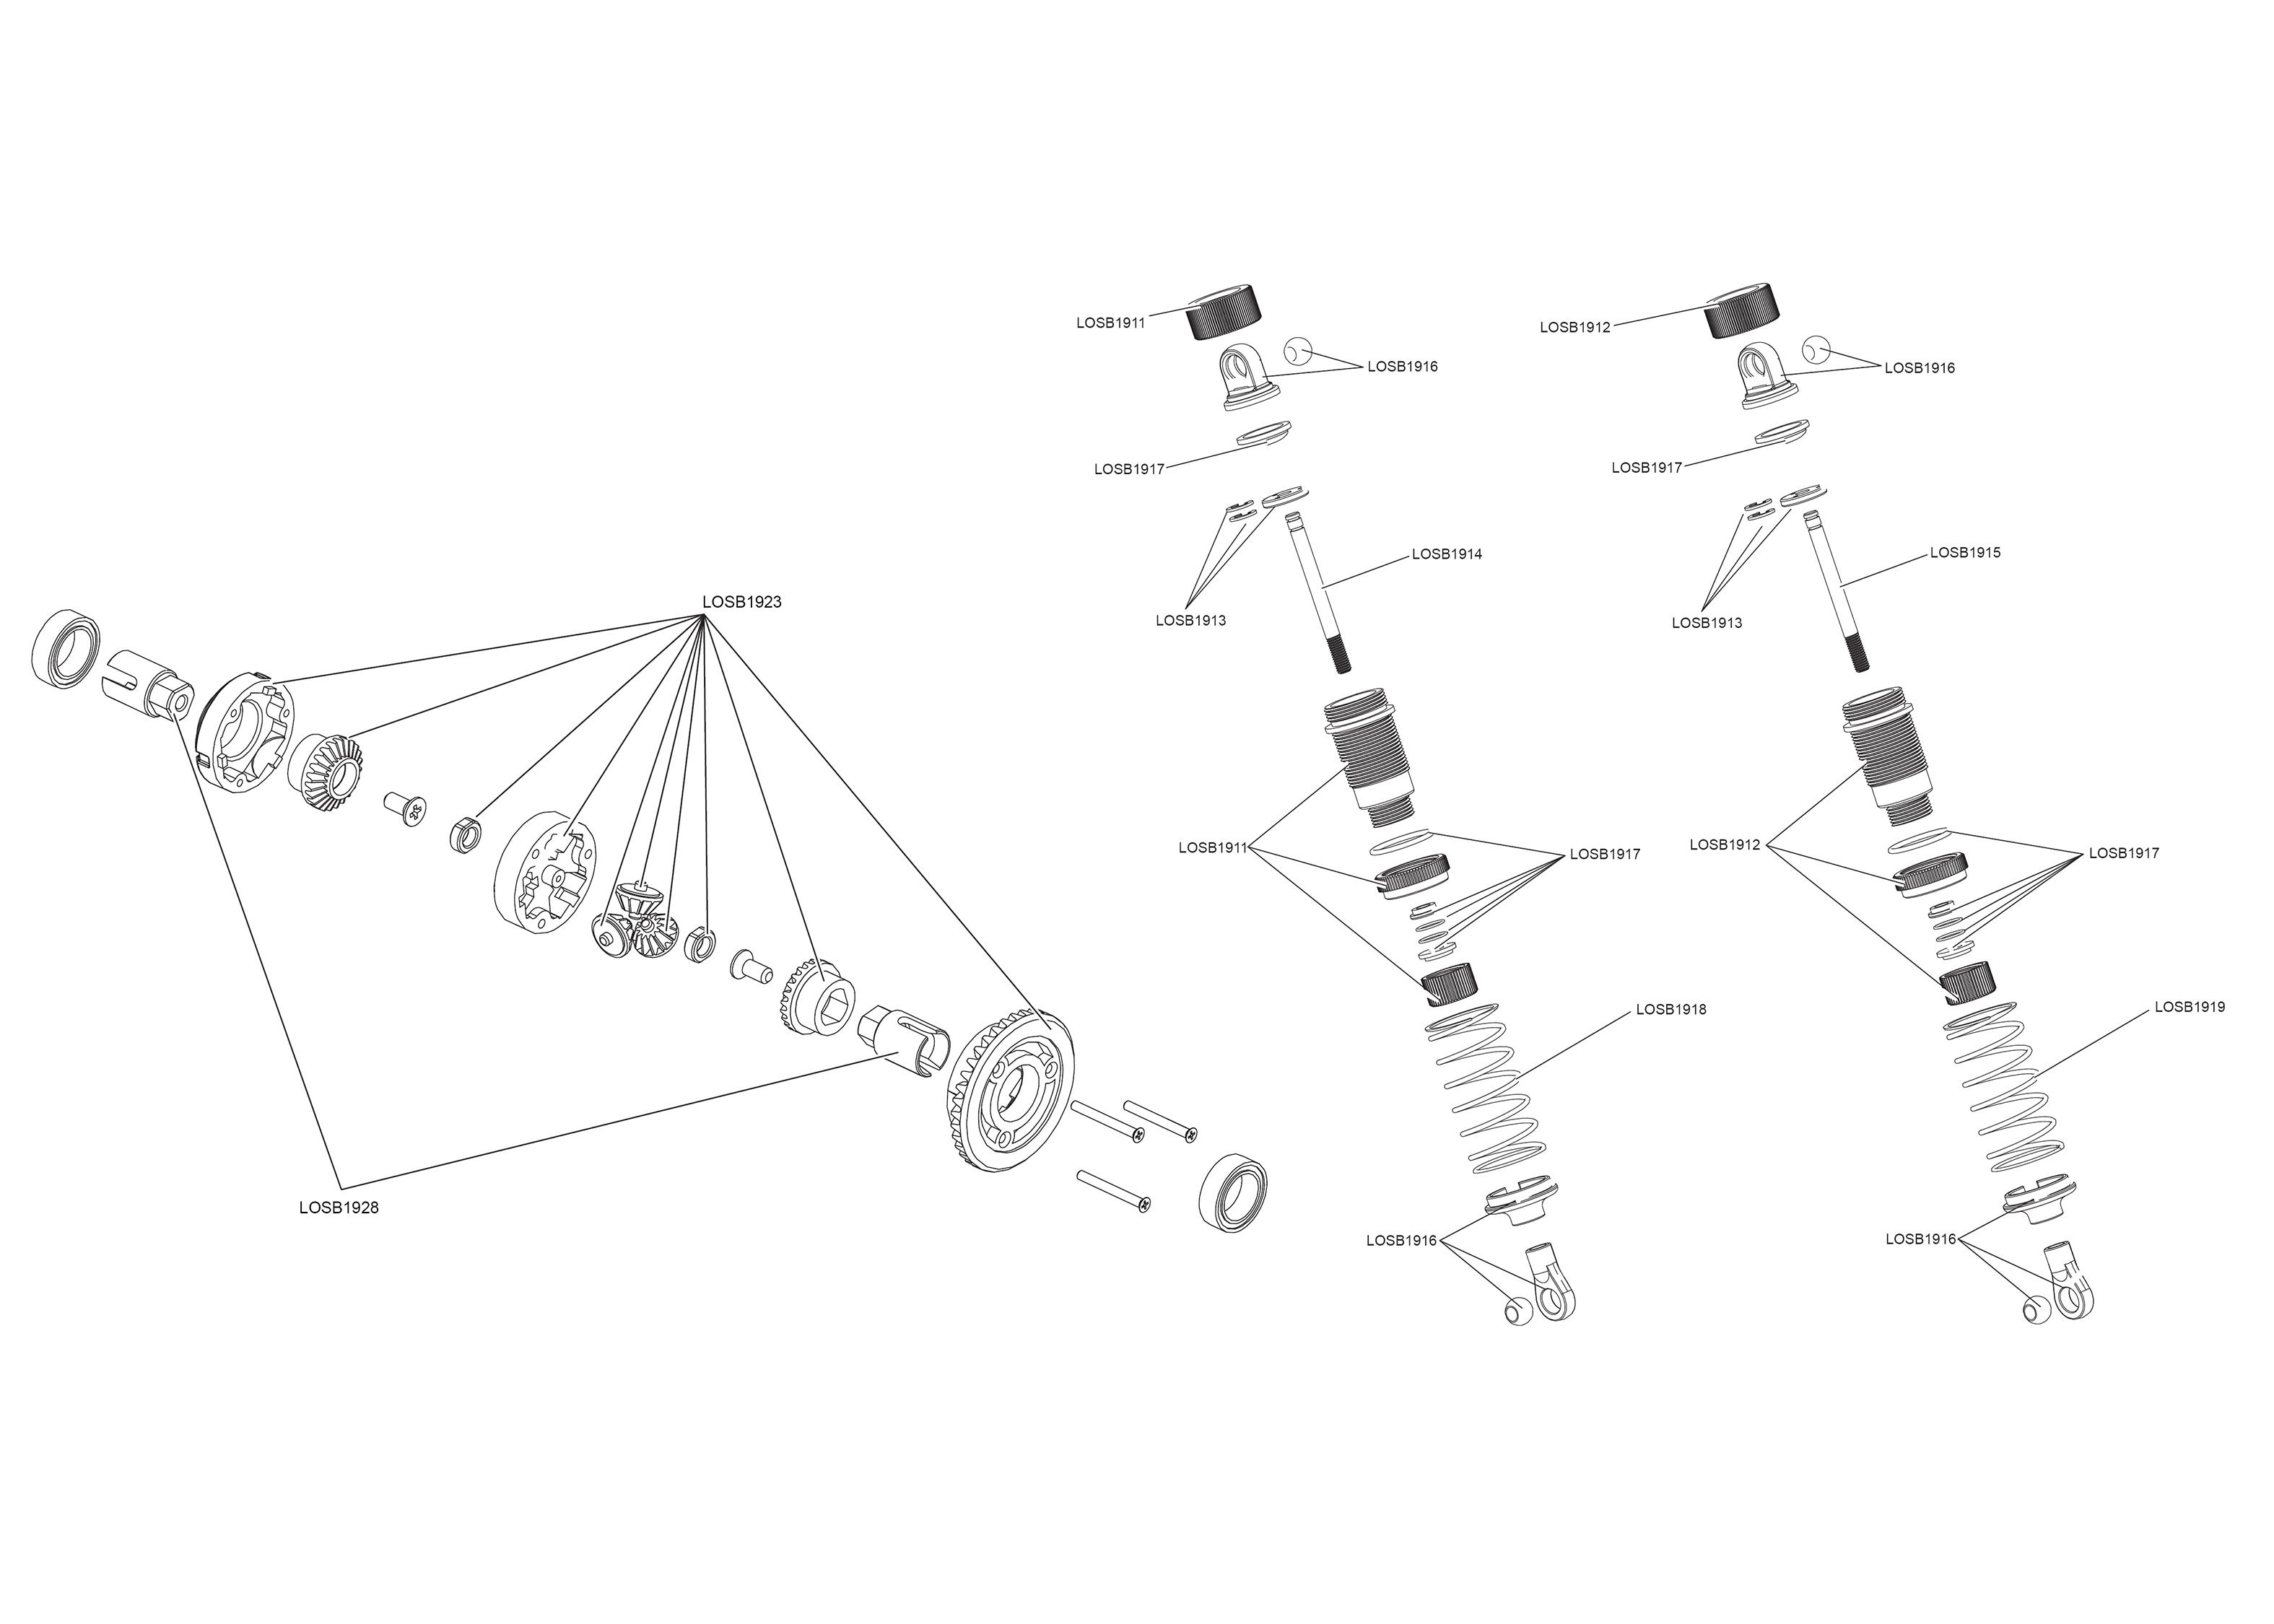 Exploded View Losi Mini 8ight 114 4wd Bl Avc Rtr Diferencil Astra 1911 Diagram